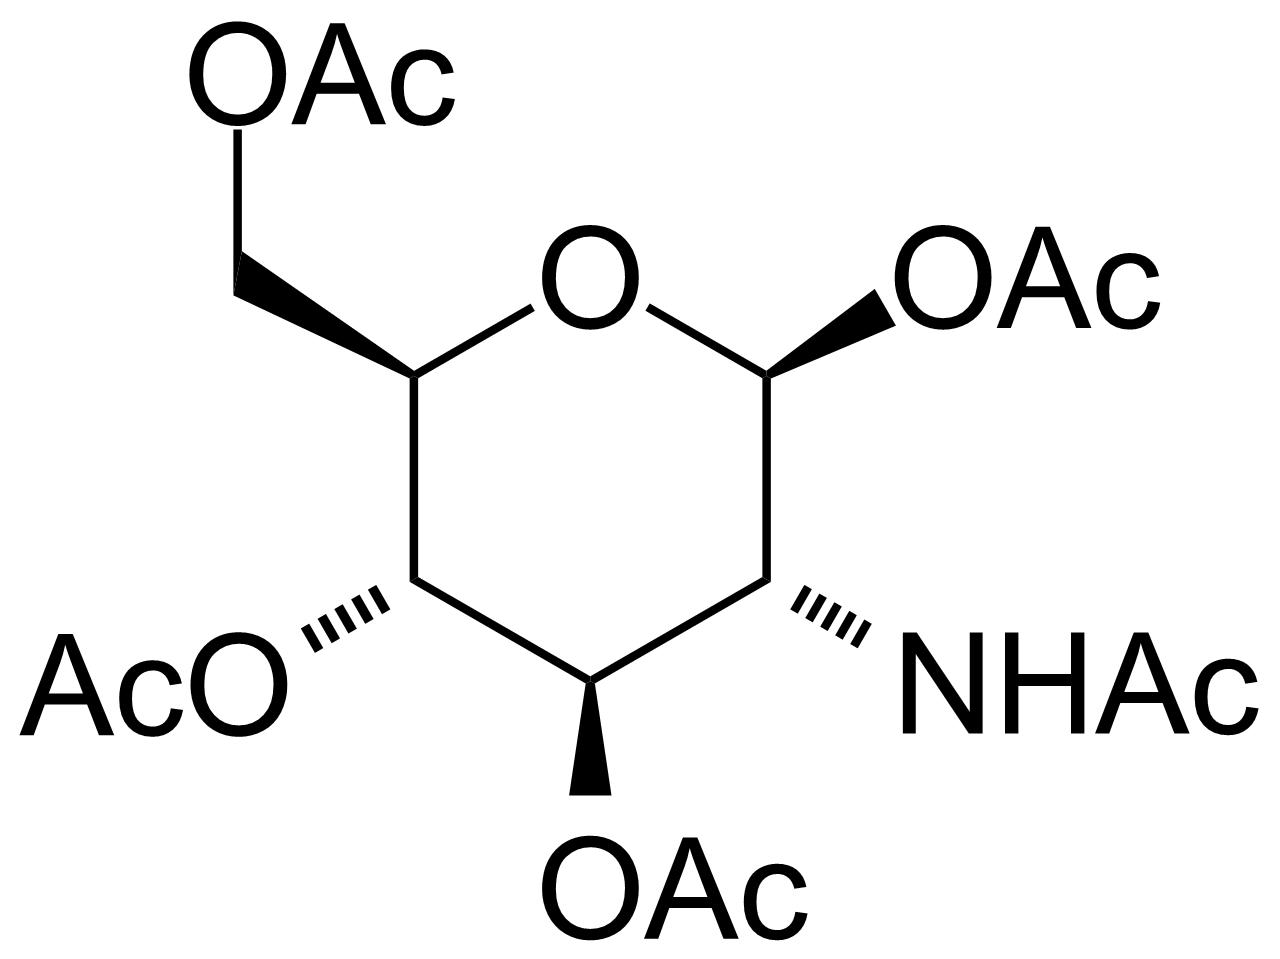 Structure of 2-Acetamido-1,3,4,6-tetra-O-acetyl-2-deoxy-beta-D-glucopyranose